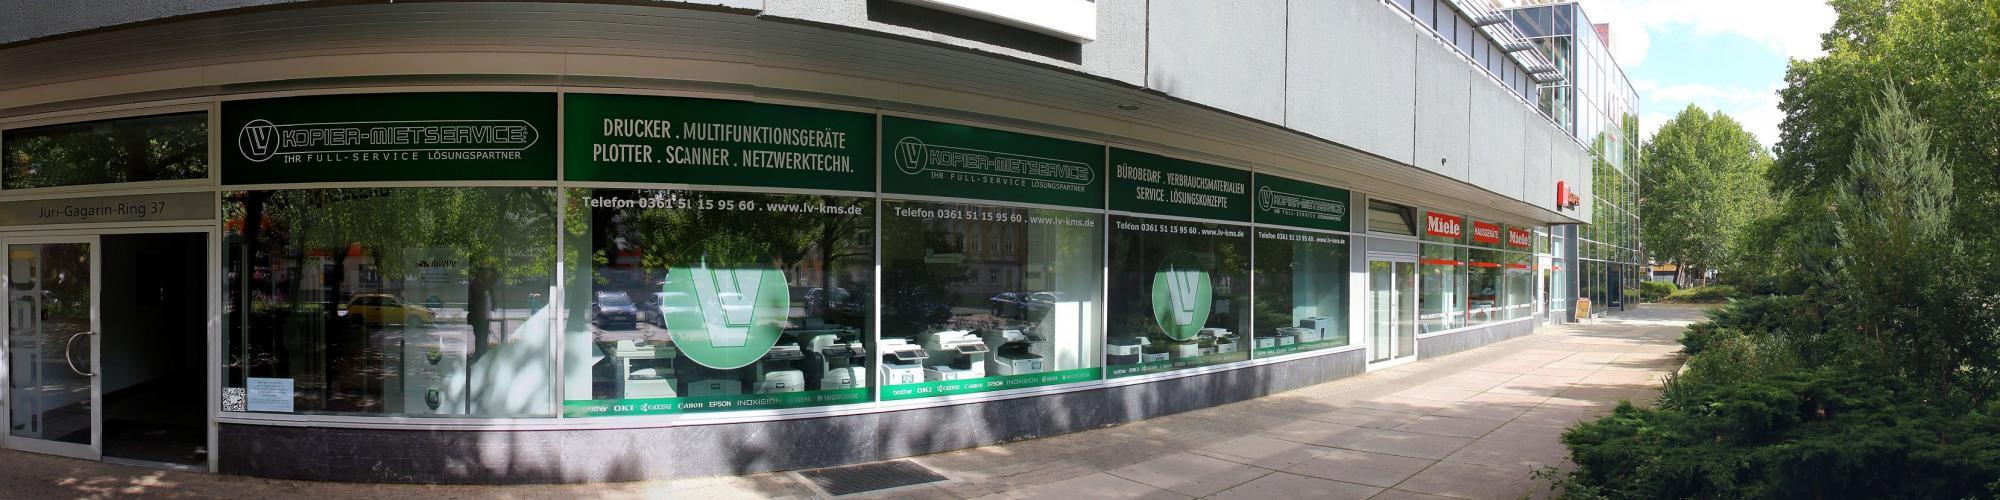 LV Kopier-Mietservice GmbH